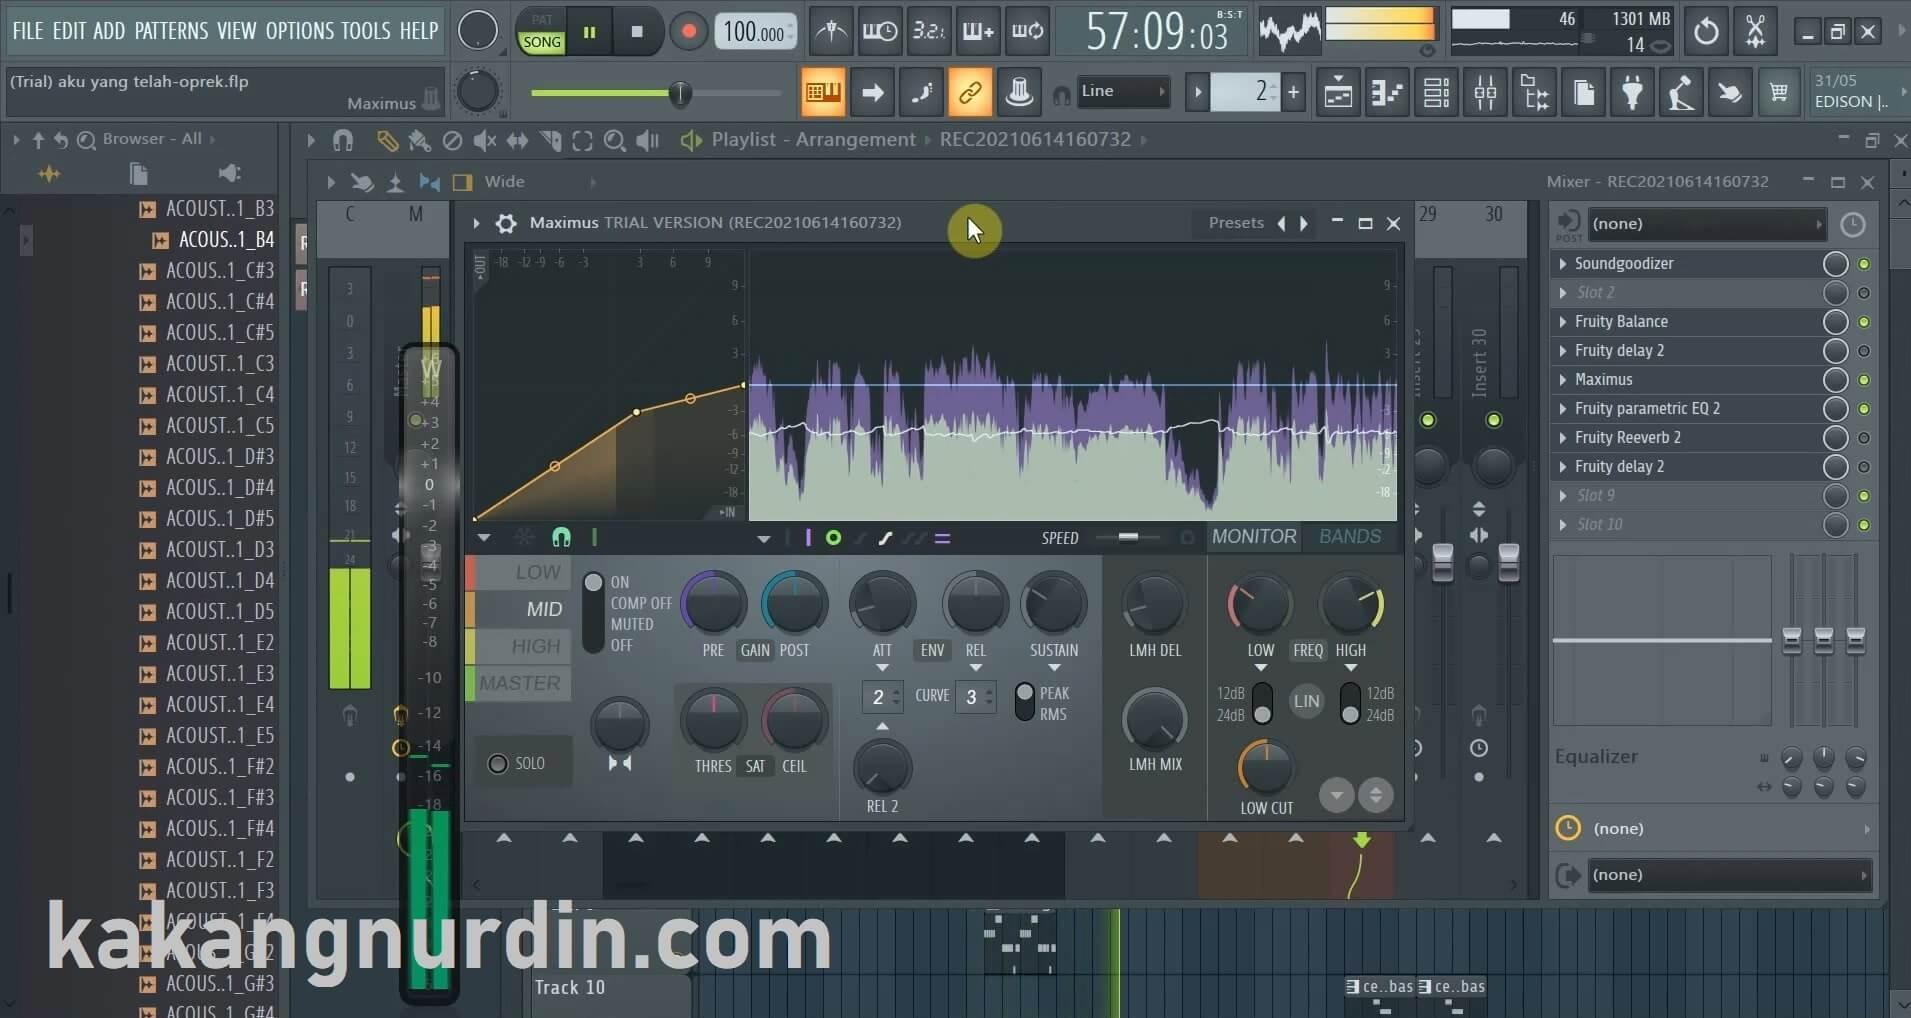 Cara membuat musik untuk lagu ciptaan sendiri menggunakan FL Studio 2021 kakangnurdin.com